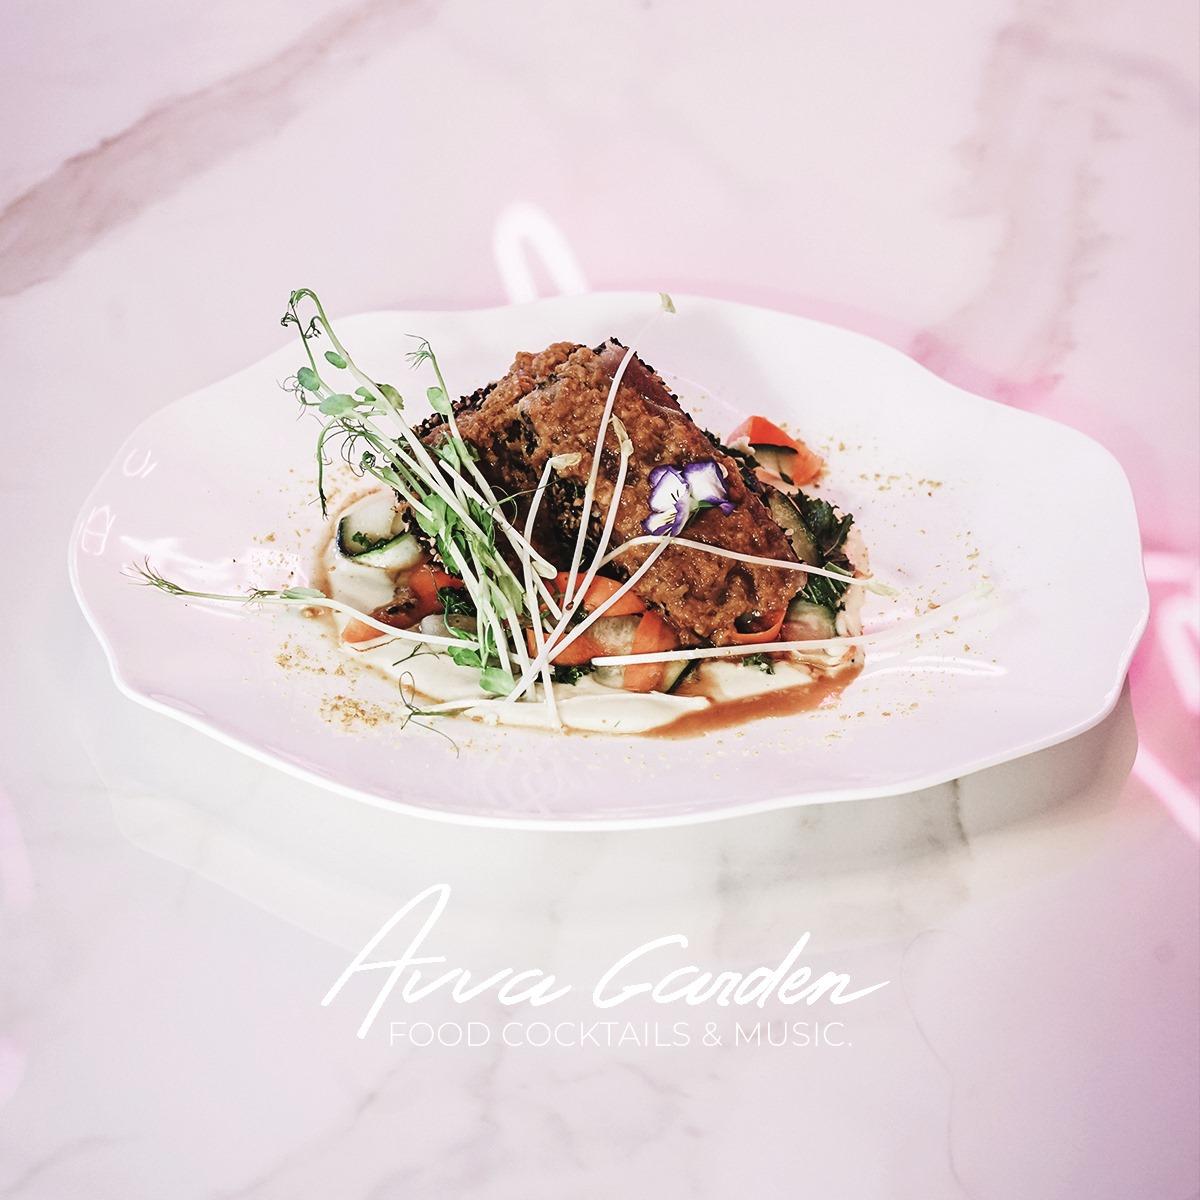 Avva-Garden-cuisine-tonique